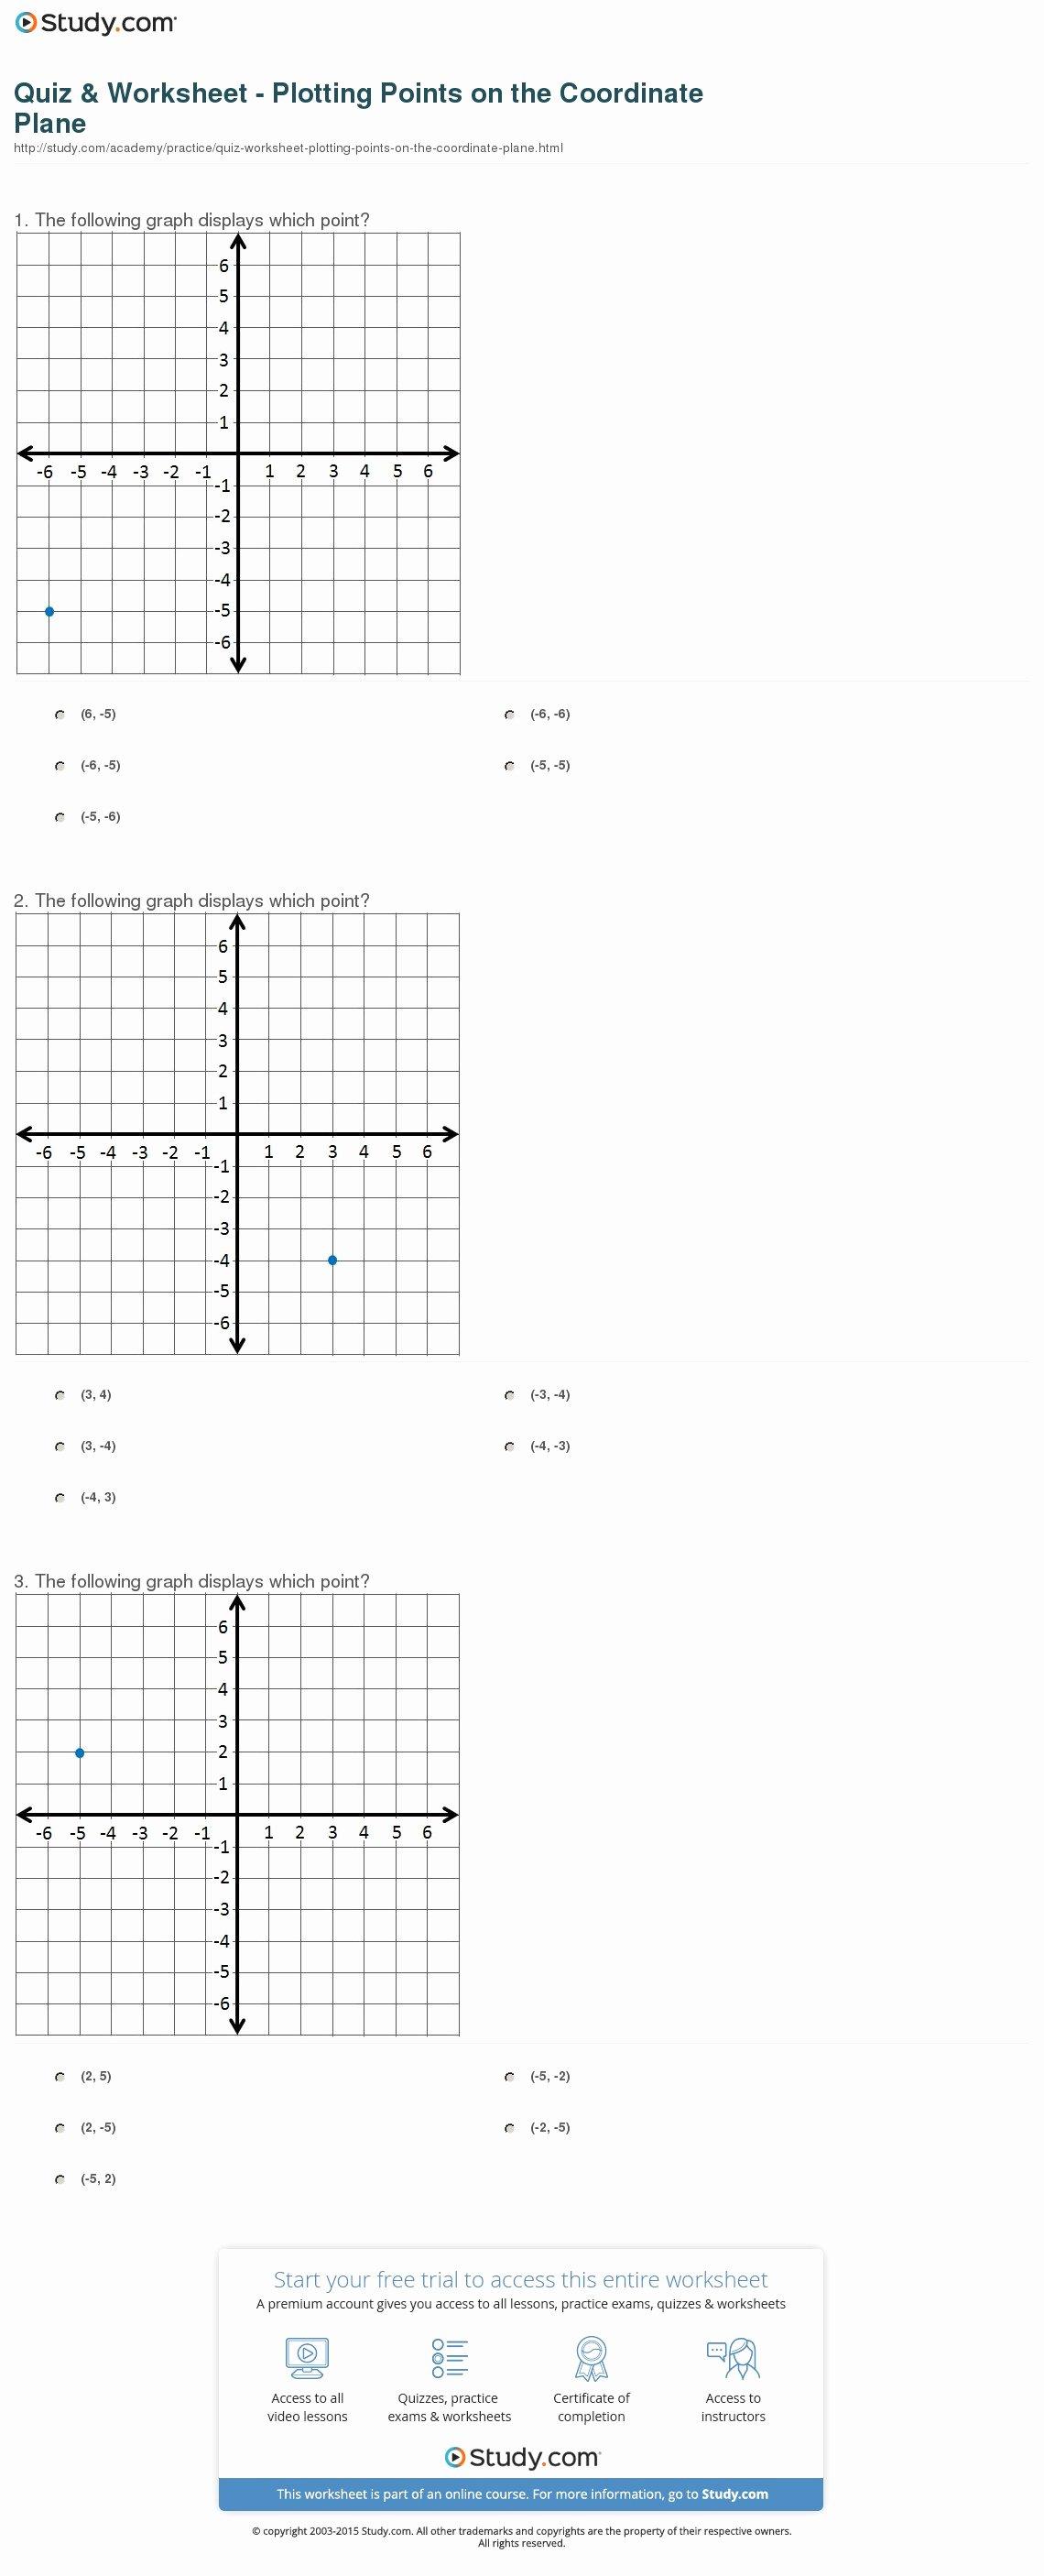 Plotting Points Worksheet Pdf Best Of Quiz & Worksheet Plotting Points On the Coordinate Plane